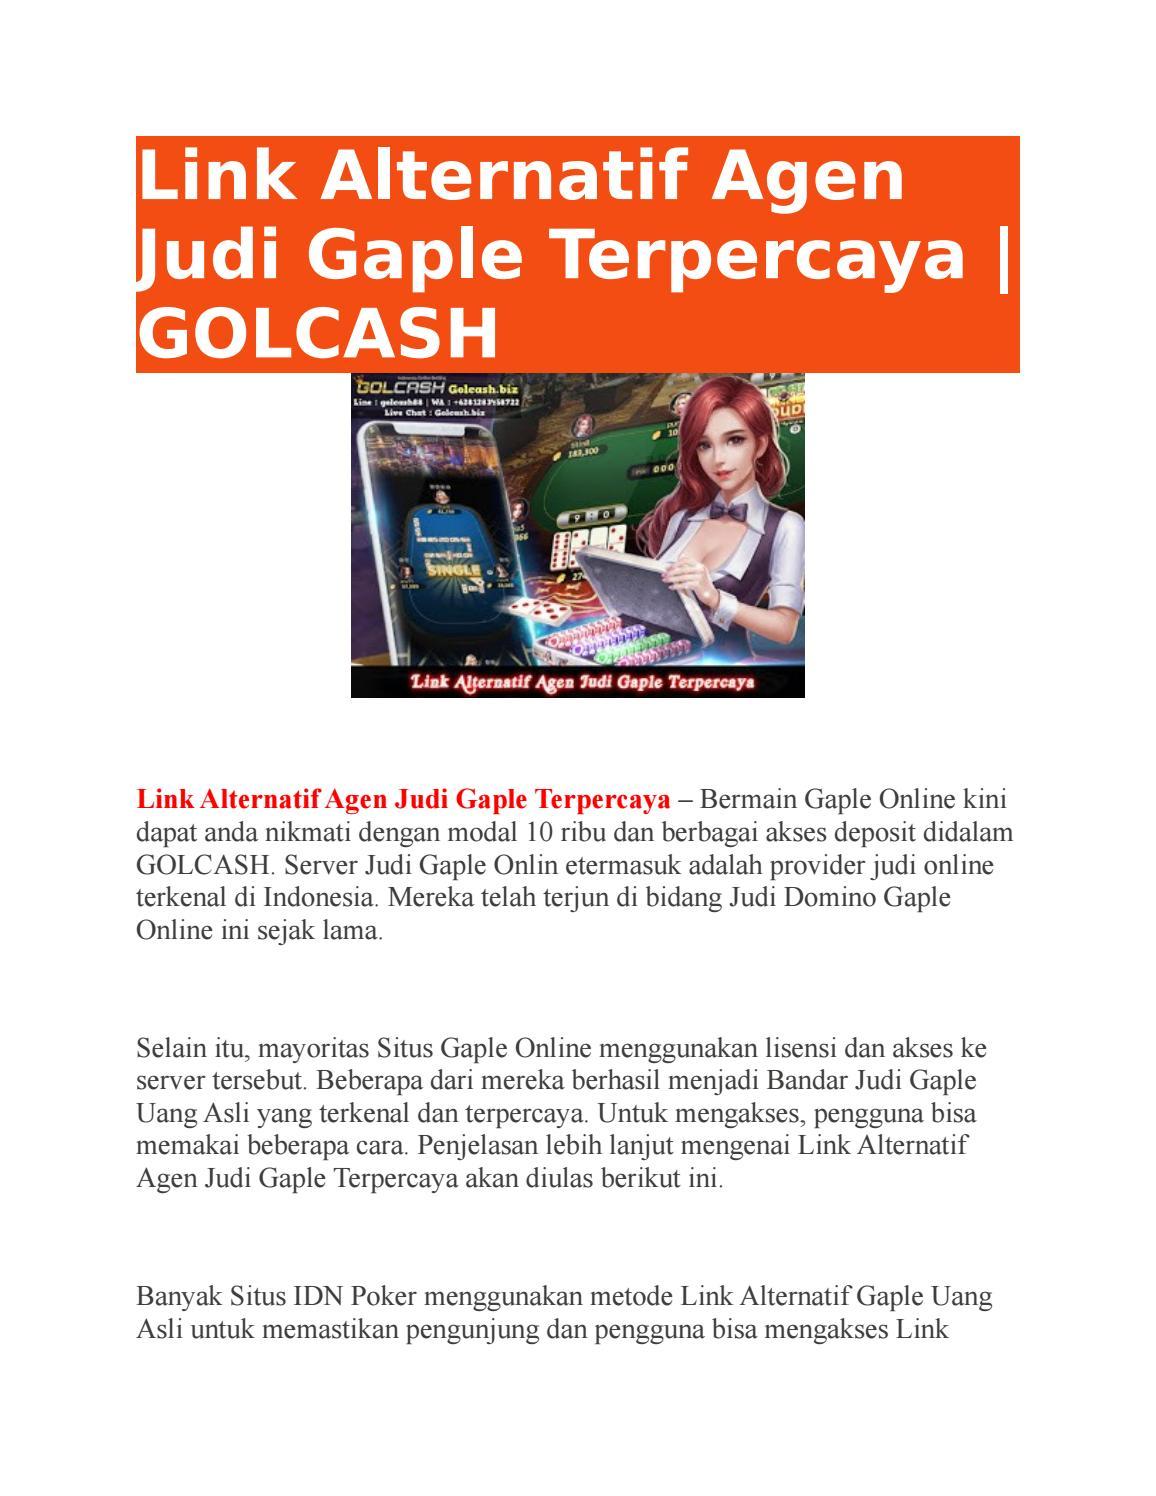 Link Alternatif Agen Judi Gaple Terpercaya Golcash By Golcash Issuu